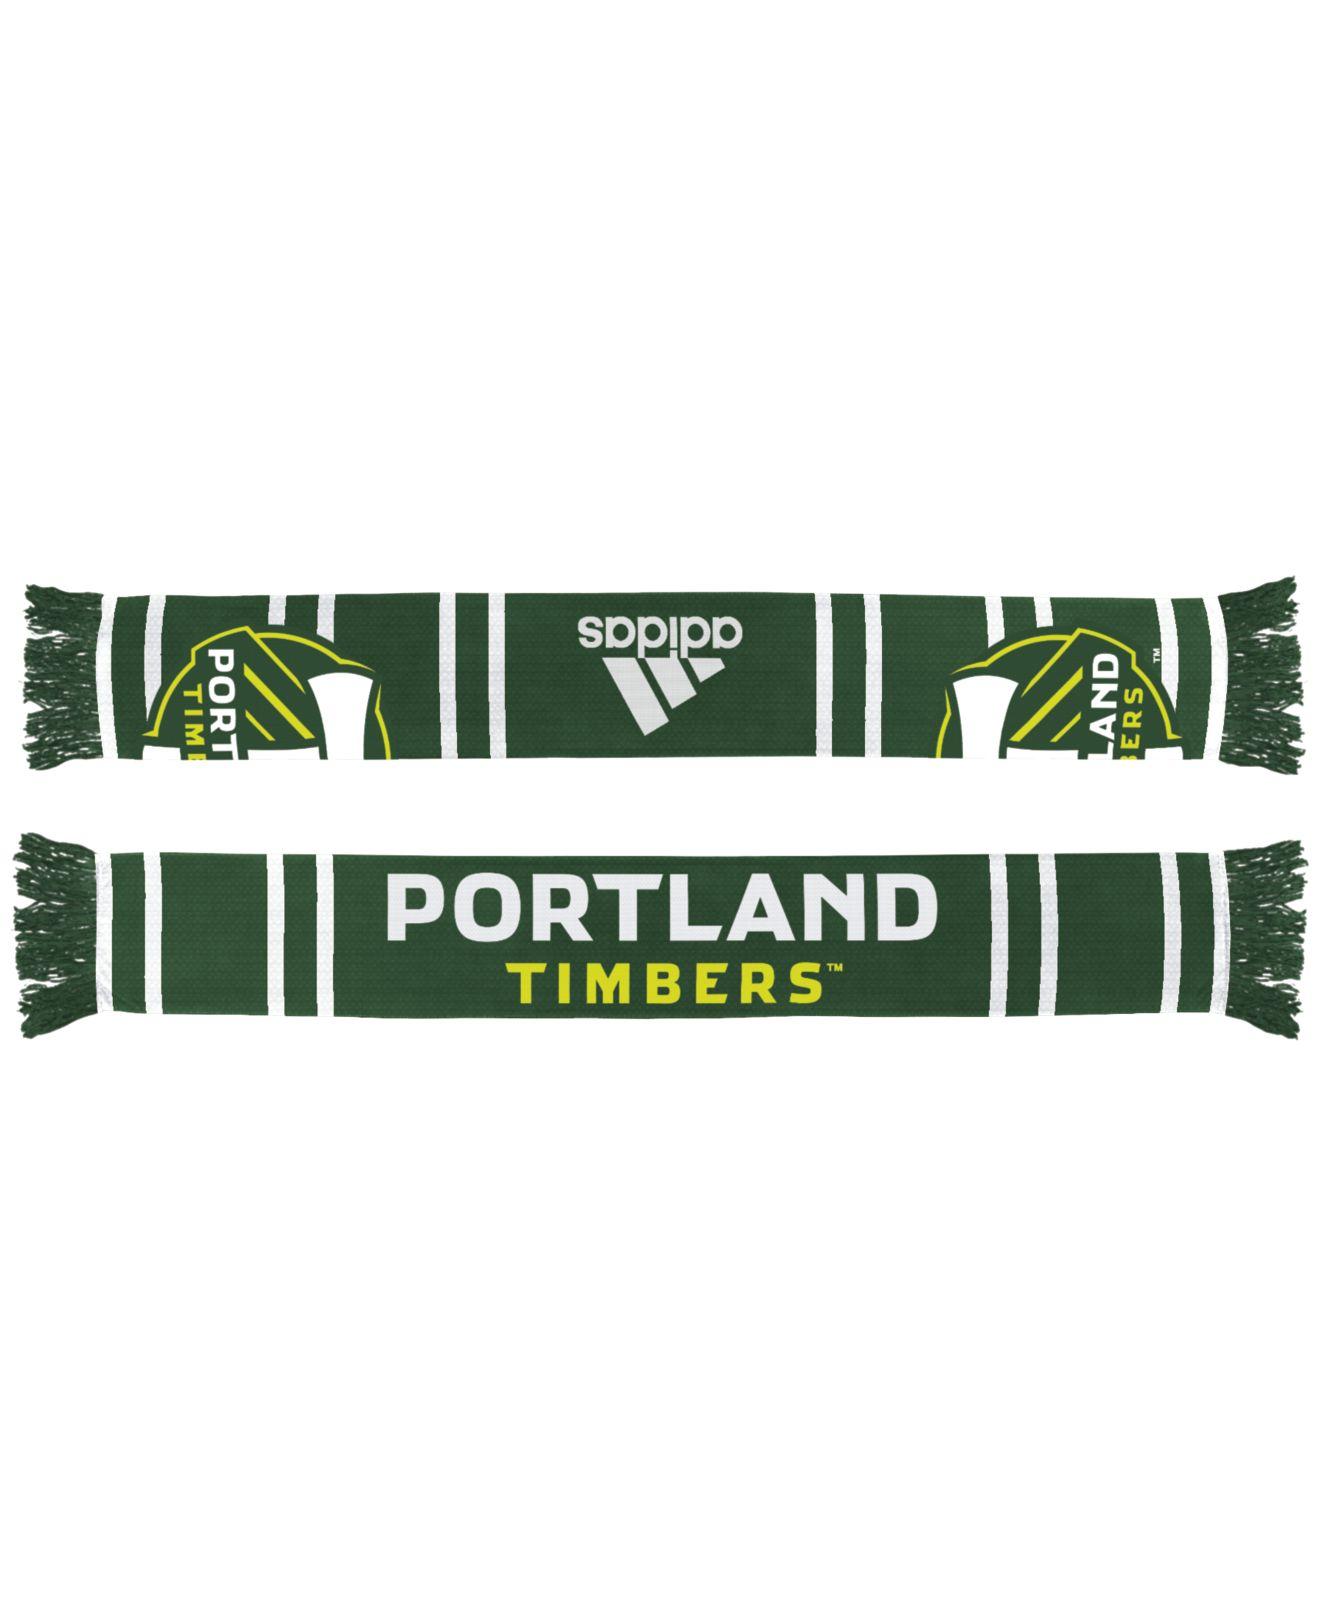 Portland Timbers: Adidas Portland Timbers Team Wordmark Scarf In Green